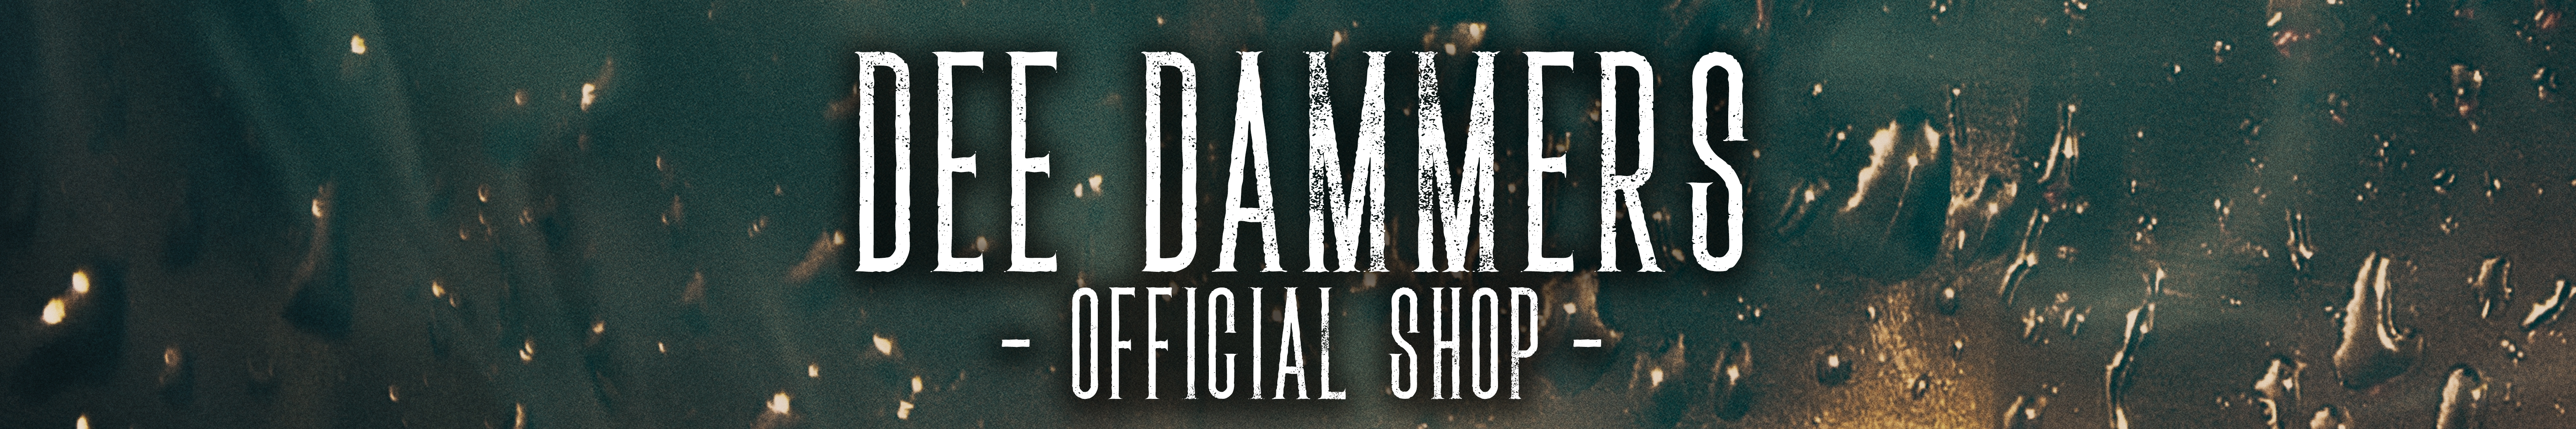 Dee Dammers - Shop